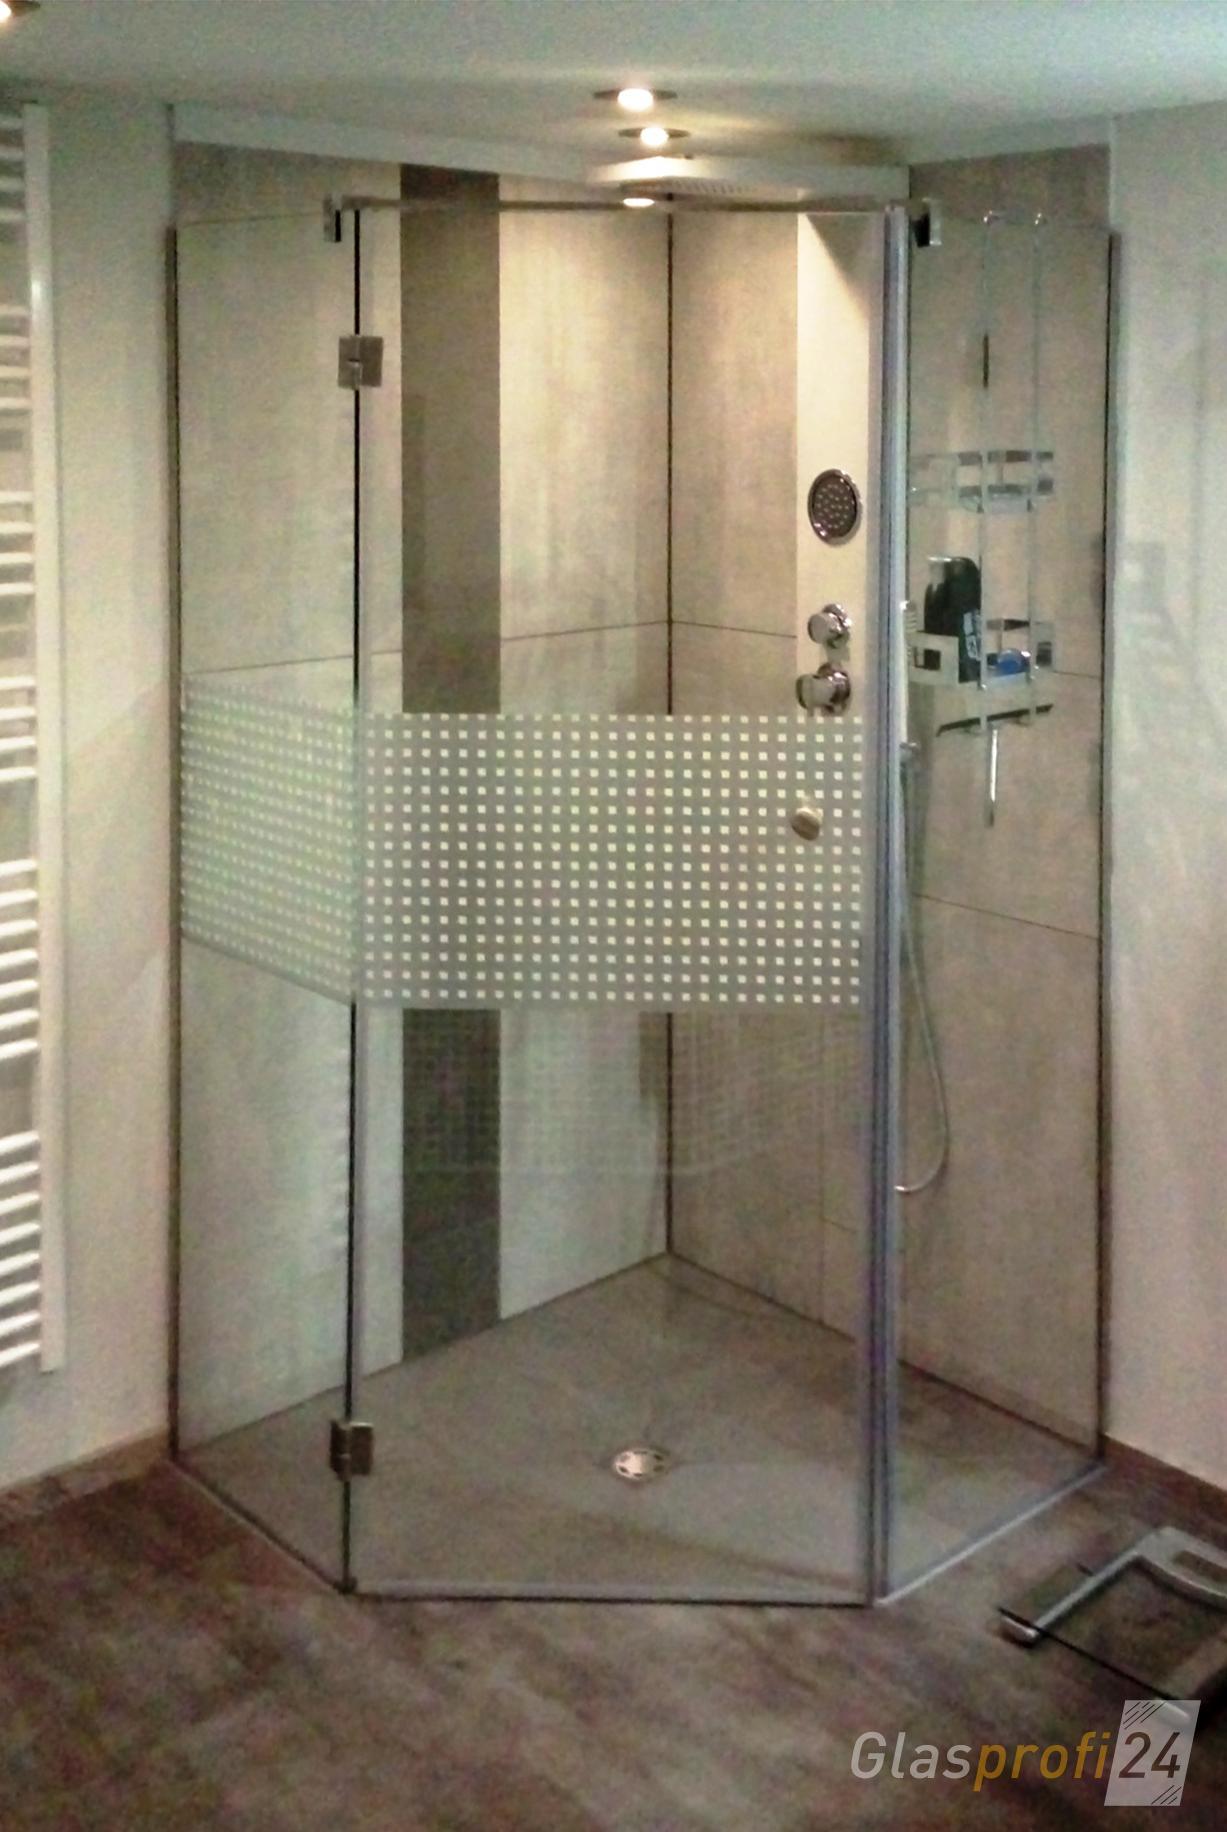 5 eck dusche aus glas glasprofi24. Black Bedroom Furniture Sets. Home Design Ideas